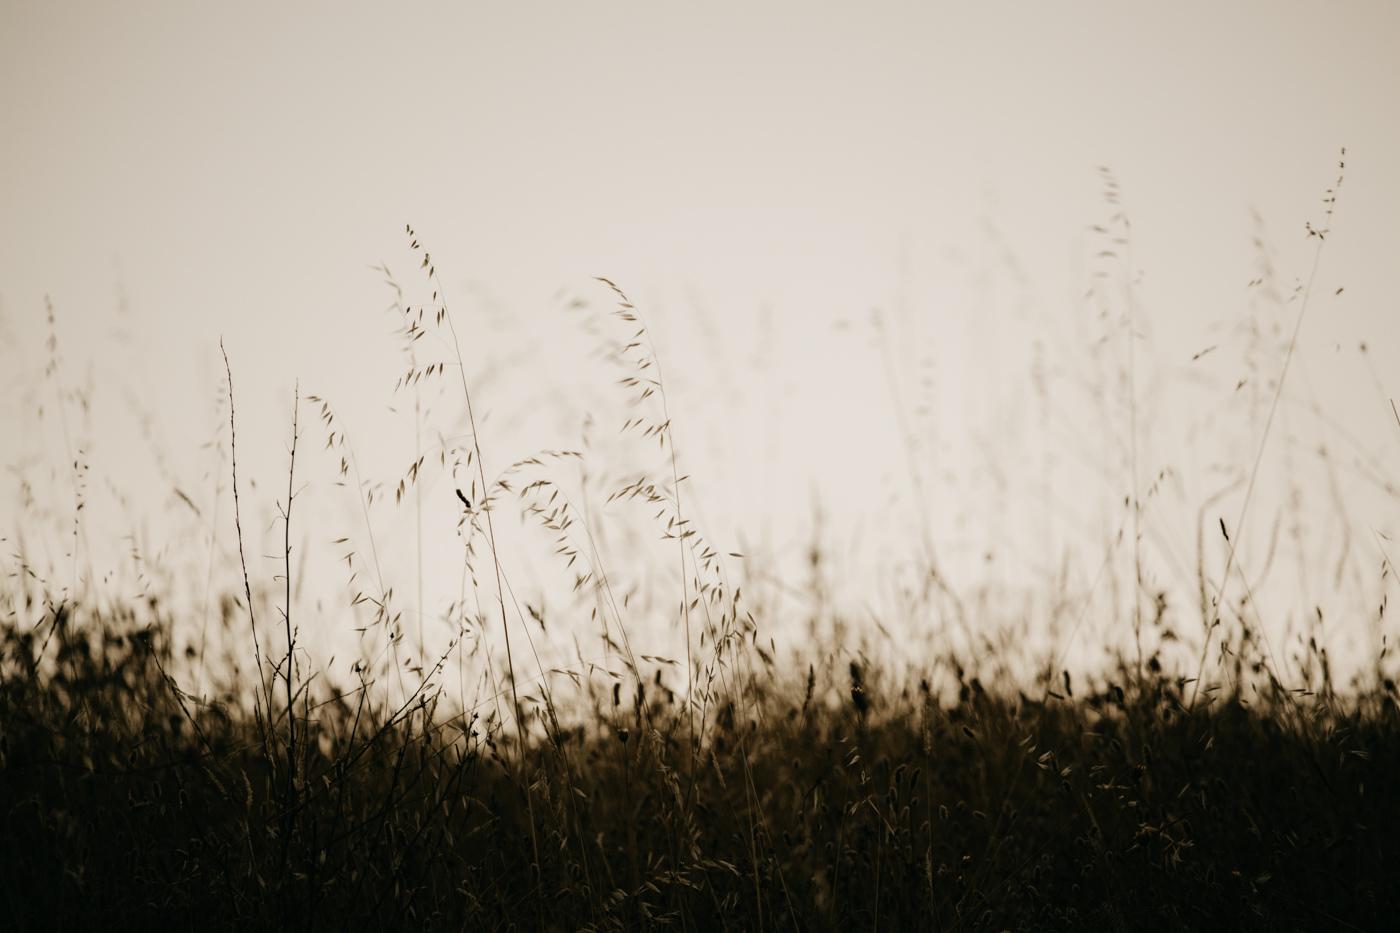 Velvet-Hush-sesion-pareja-patones-san-agustin-guadalix-048